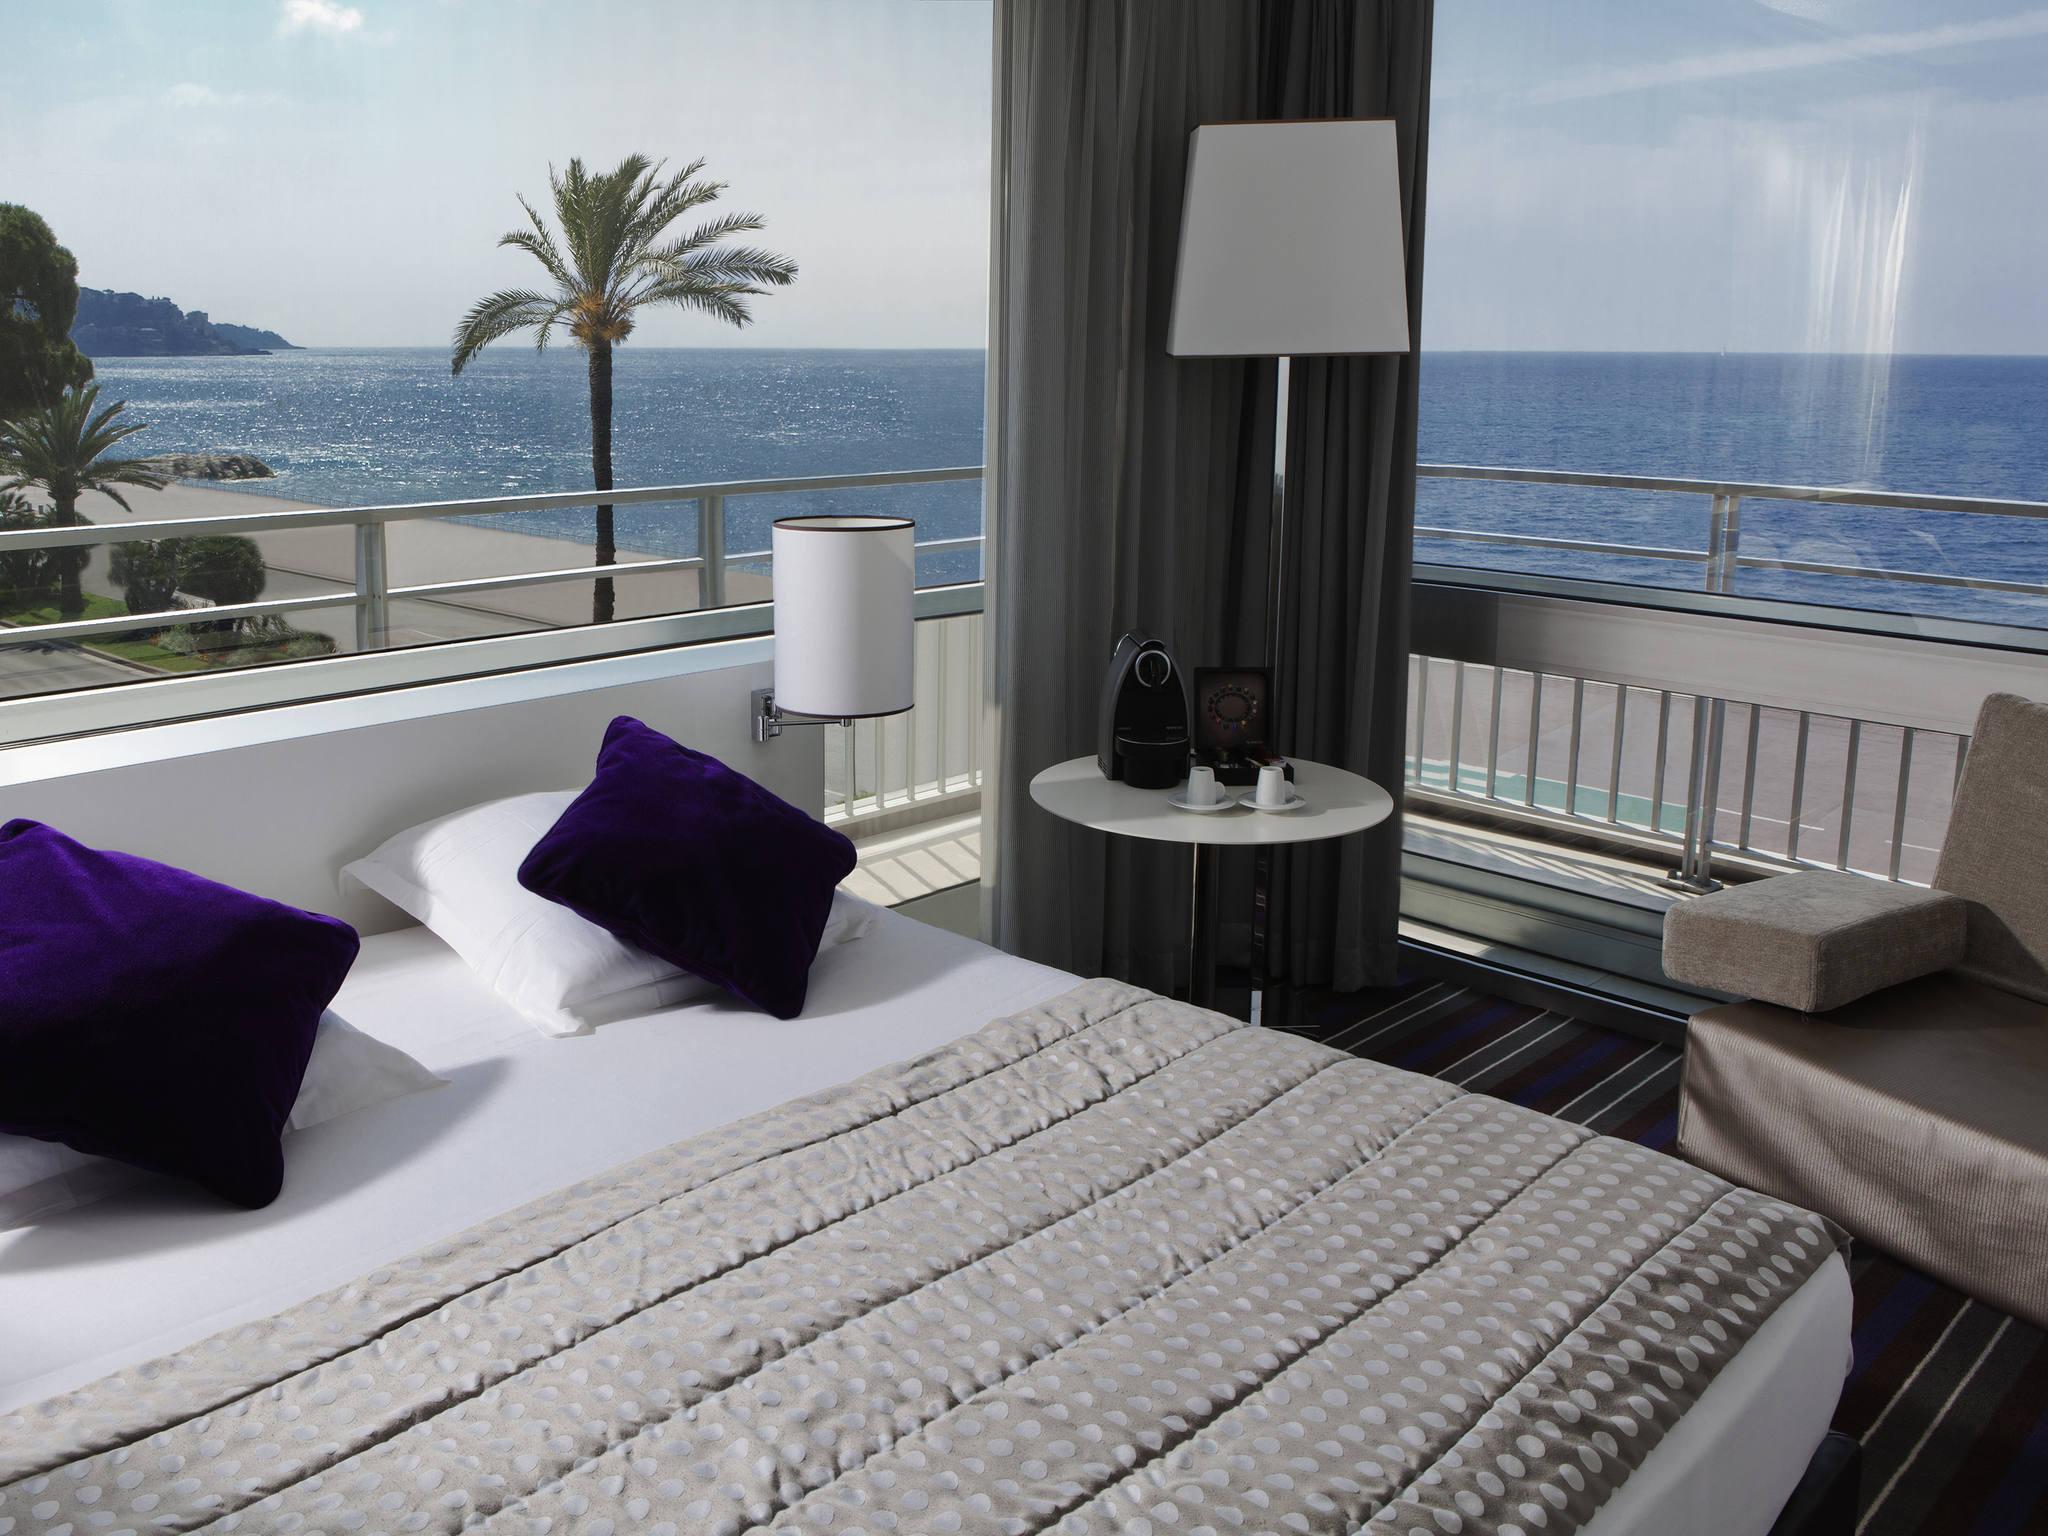 Hotel – Hotel Mercure Nice Promenade des Anglais